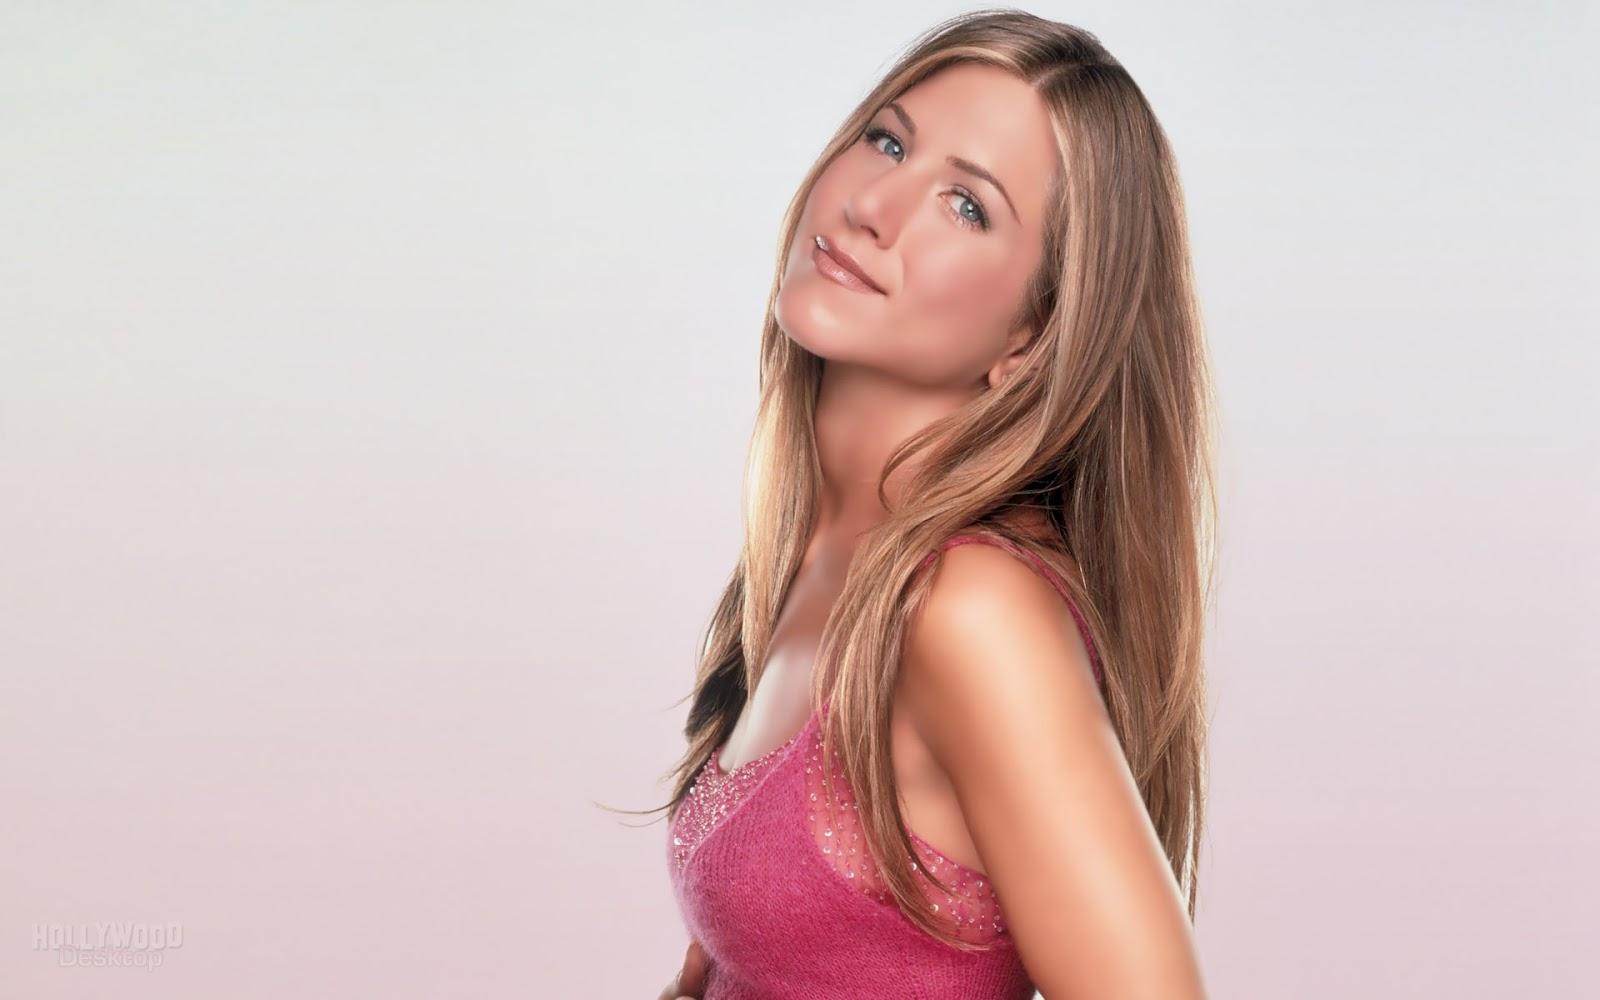 http://1.bp.blogspot.com/-7dxcEA4sgYU/UB4LokquJdI/AAAAAAAAAwM/sPmho5-JYpI/s1600/Jennifer+Aniston+Wallscelebs.blogspot+(4).jpg